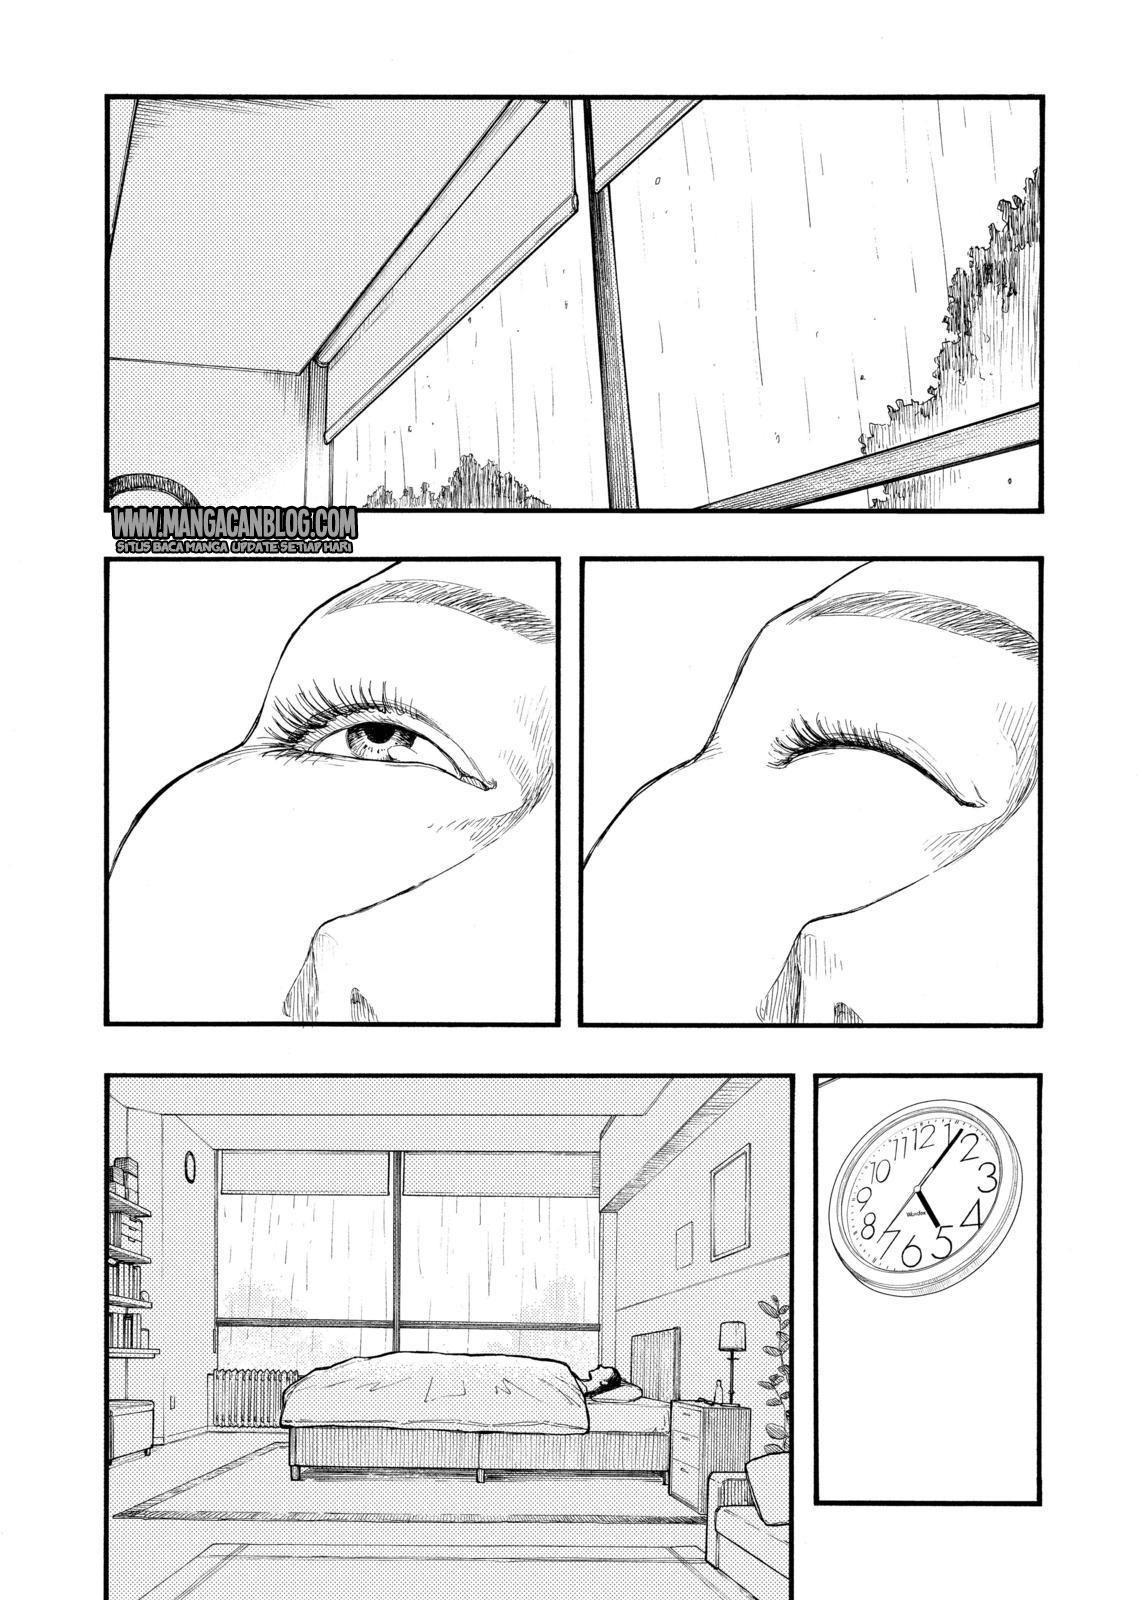 Dilarang COPAS - situs resmi www.mangacanblog.com - Komik ajin 046 - selamat pagi, sampai jumpa besok 47 Indonesia ajin 046 - selamat pagi, sampai jumpa besok Terbaru 2|Baca Manga Komik Indonesia|Mangacan